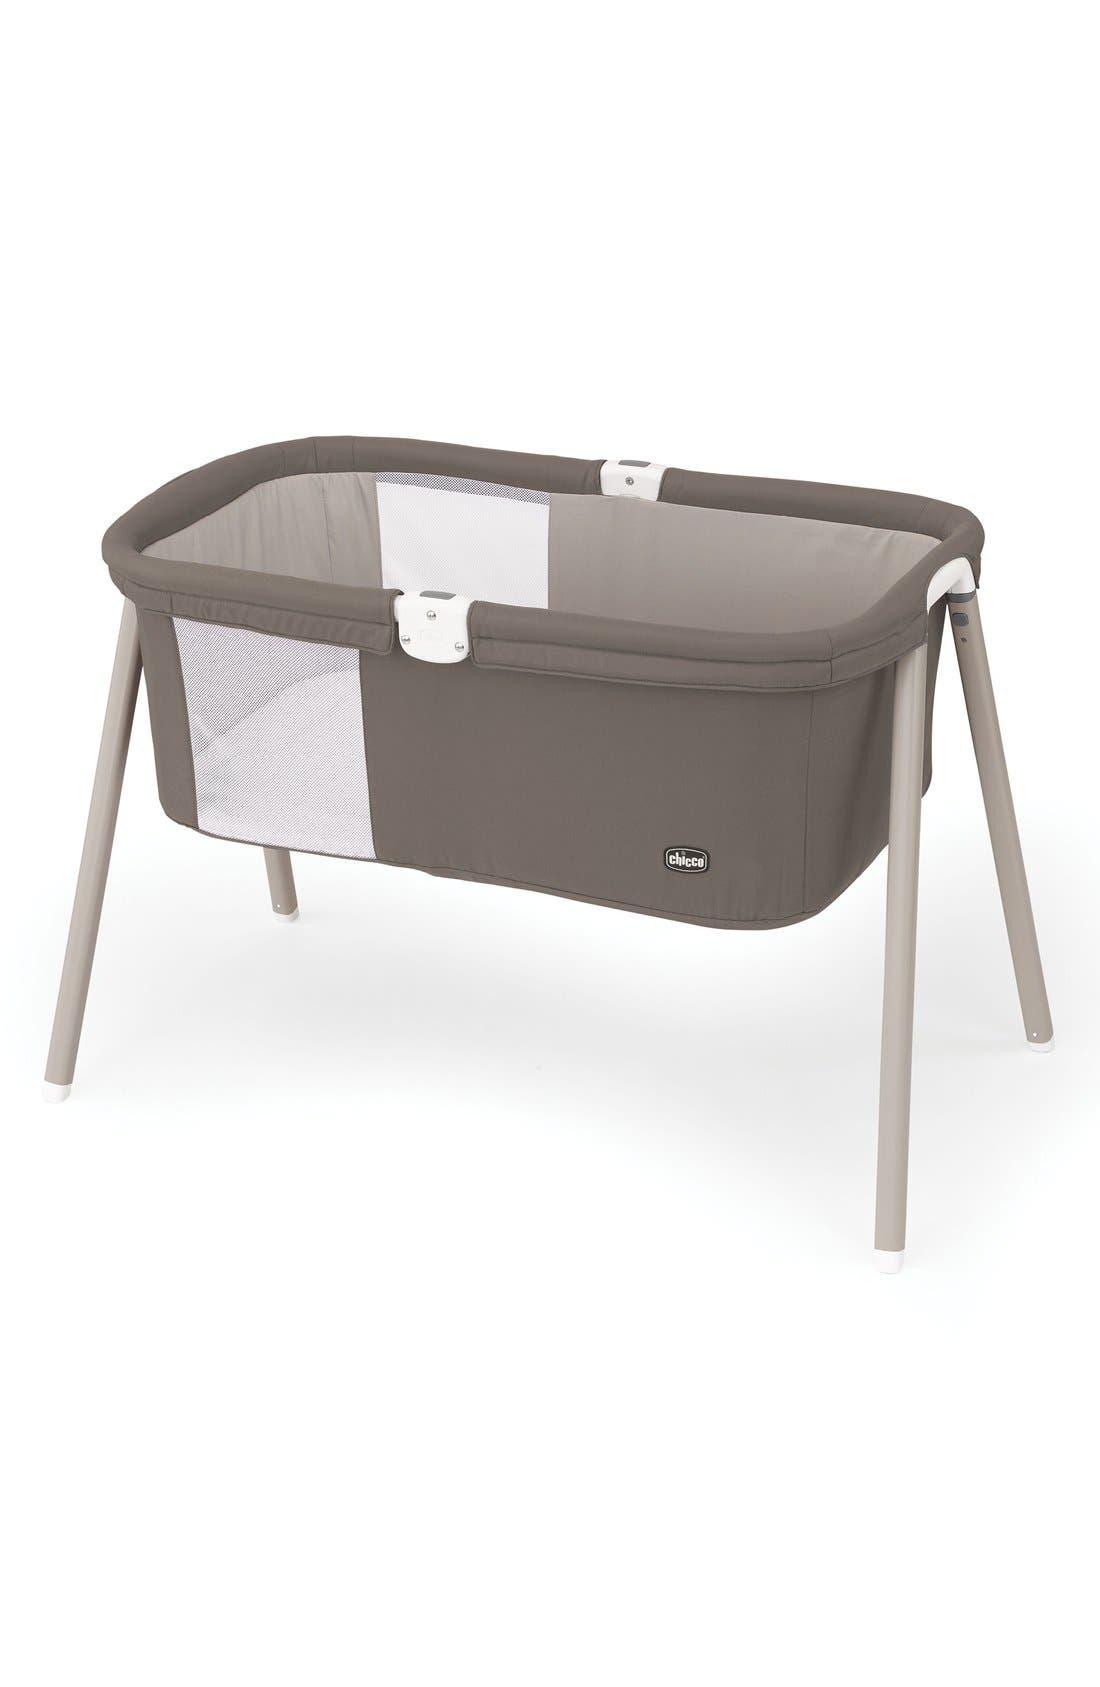 graco bedroom bassinet. chicco \u0027lullago\u0027 portable bassinet graco bedroom